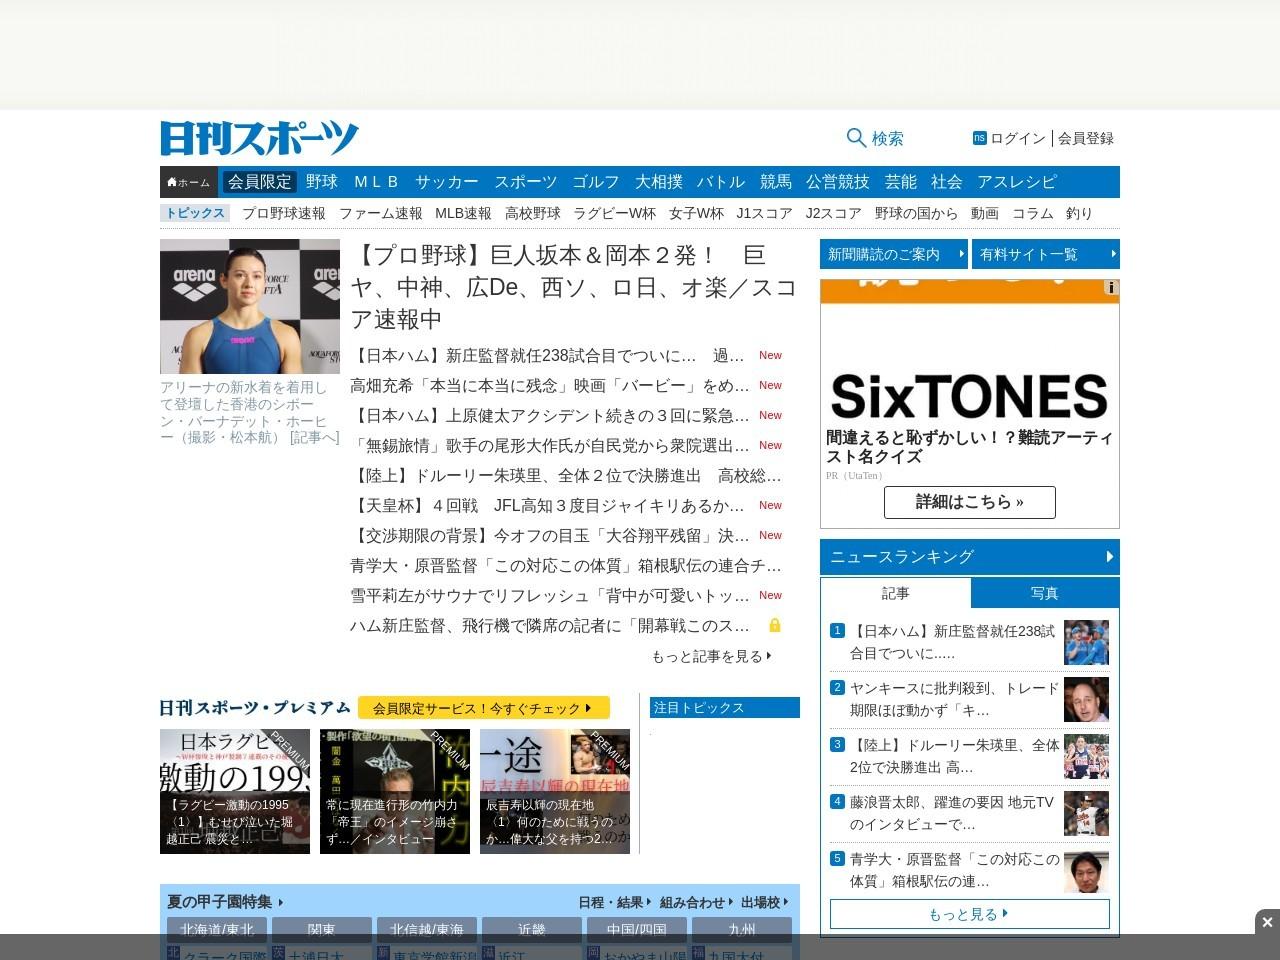 中京大中京・浦松千聖が学校別の3連覇に貢献